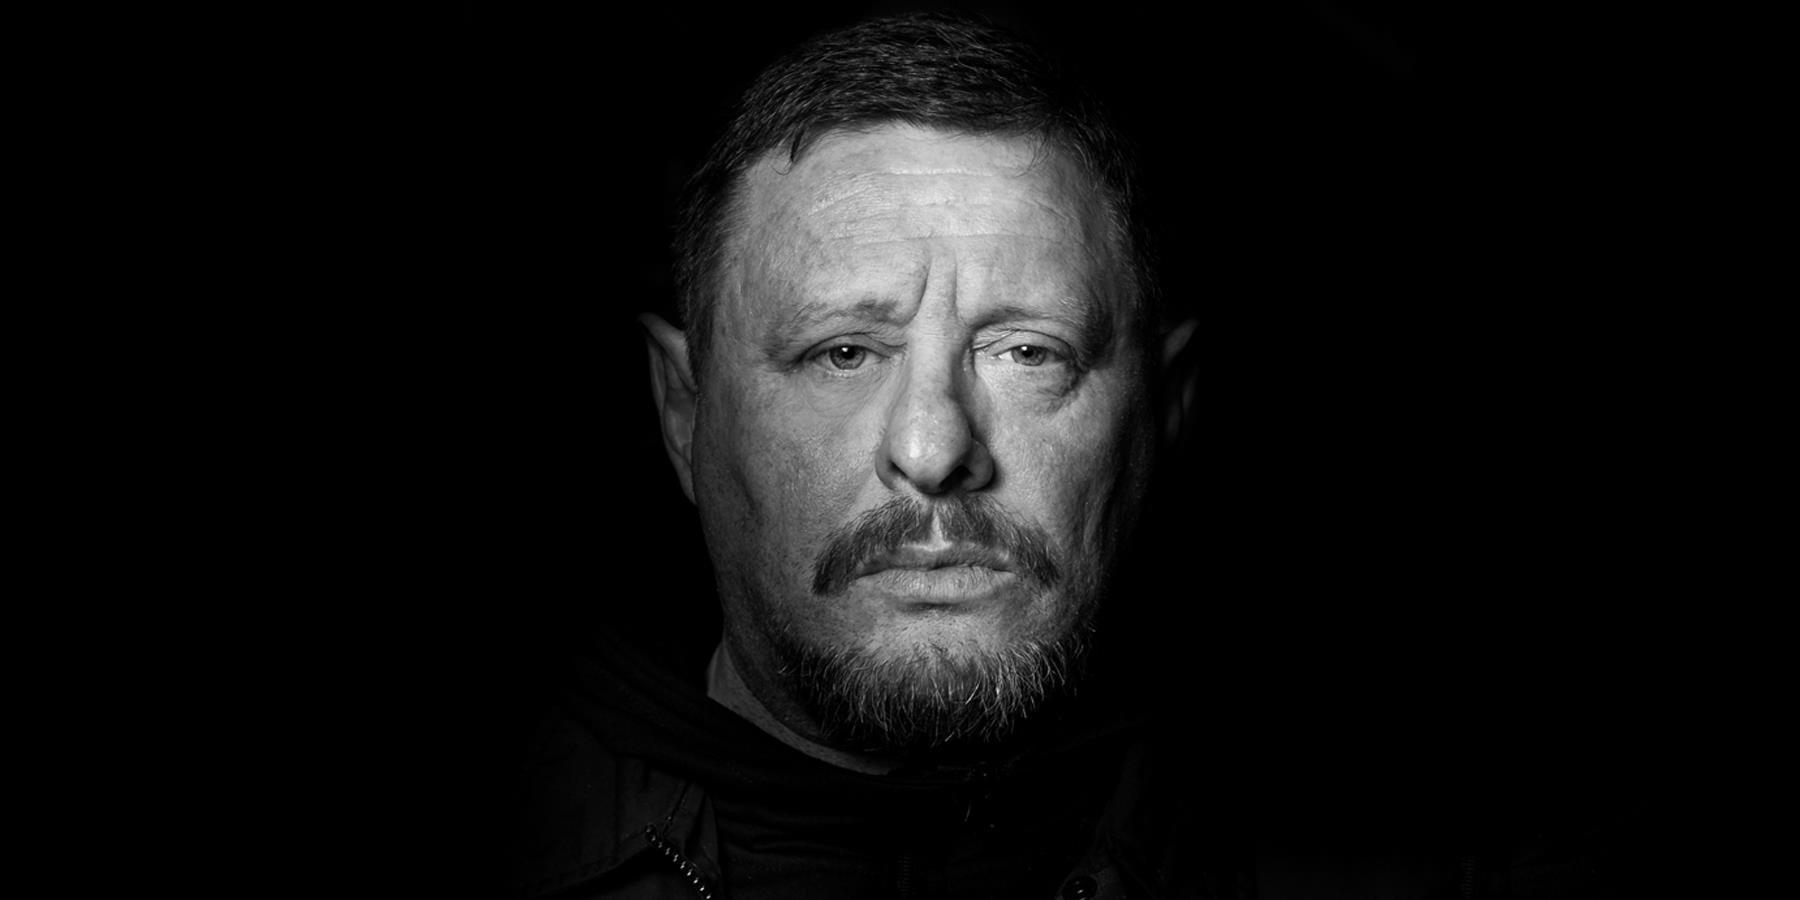 Shaun Ryder black and white pic